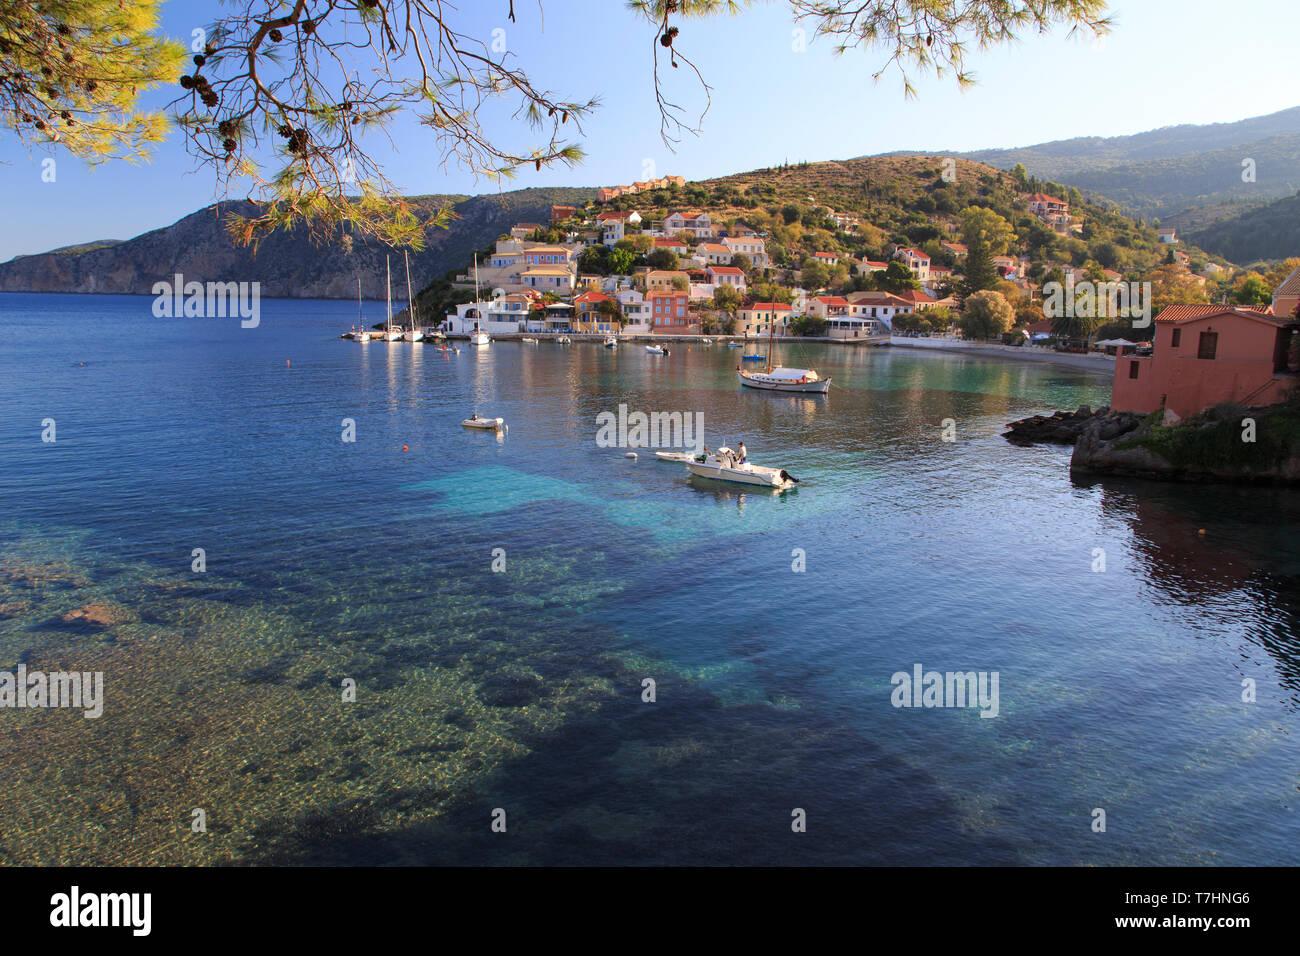 Greece, Ionian Islands, Kefalonia, Myrtos Beach - Stock Image